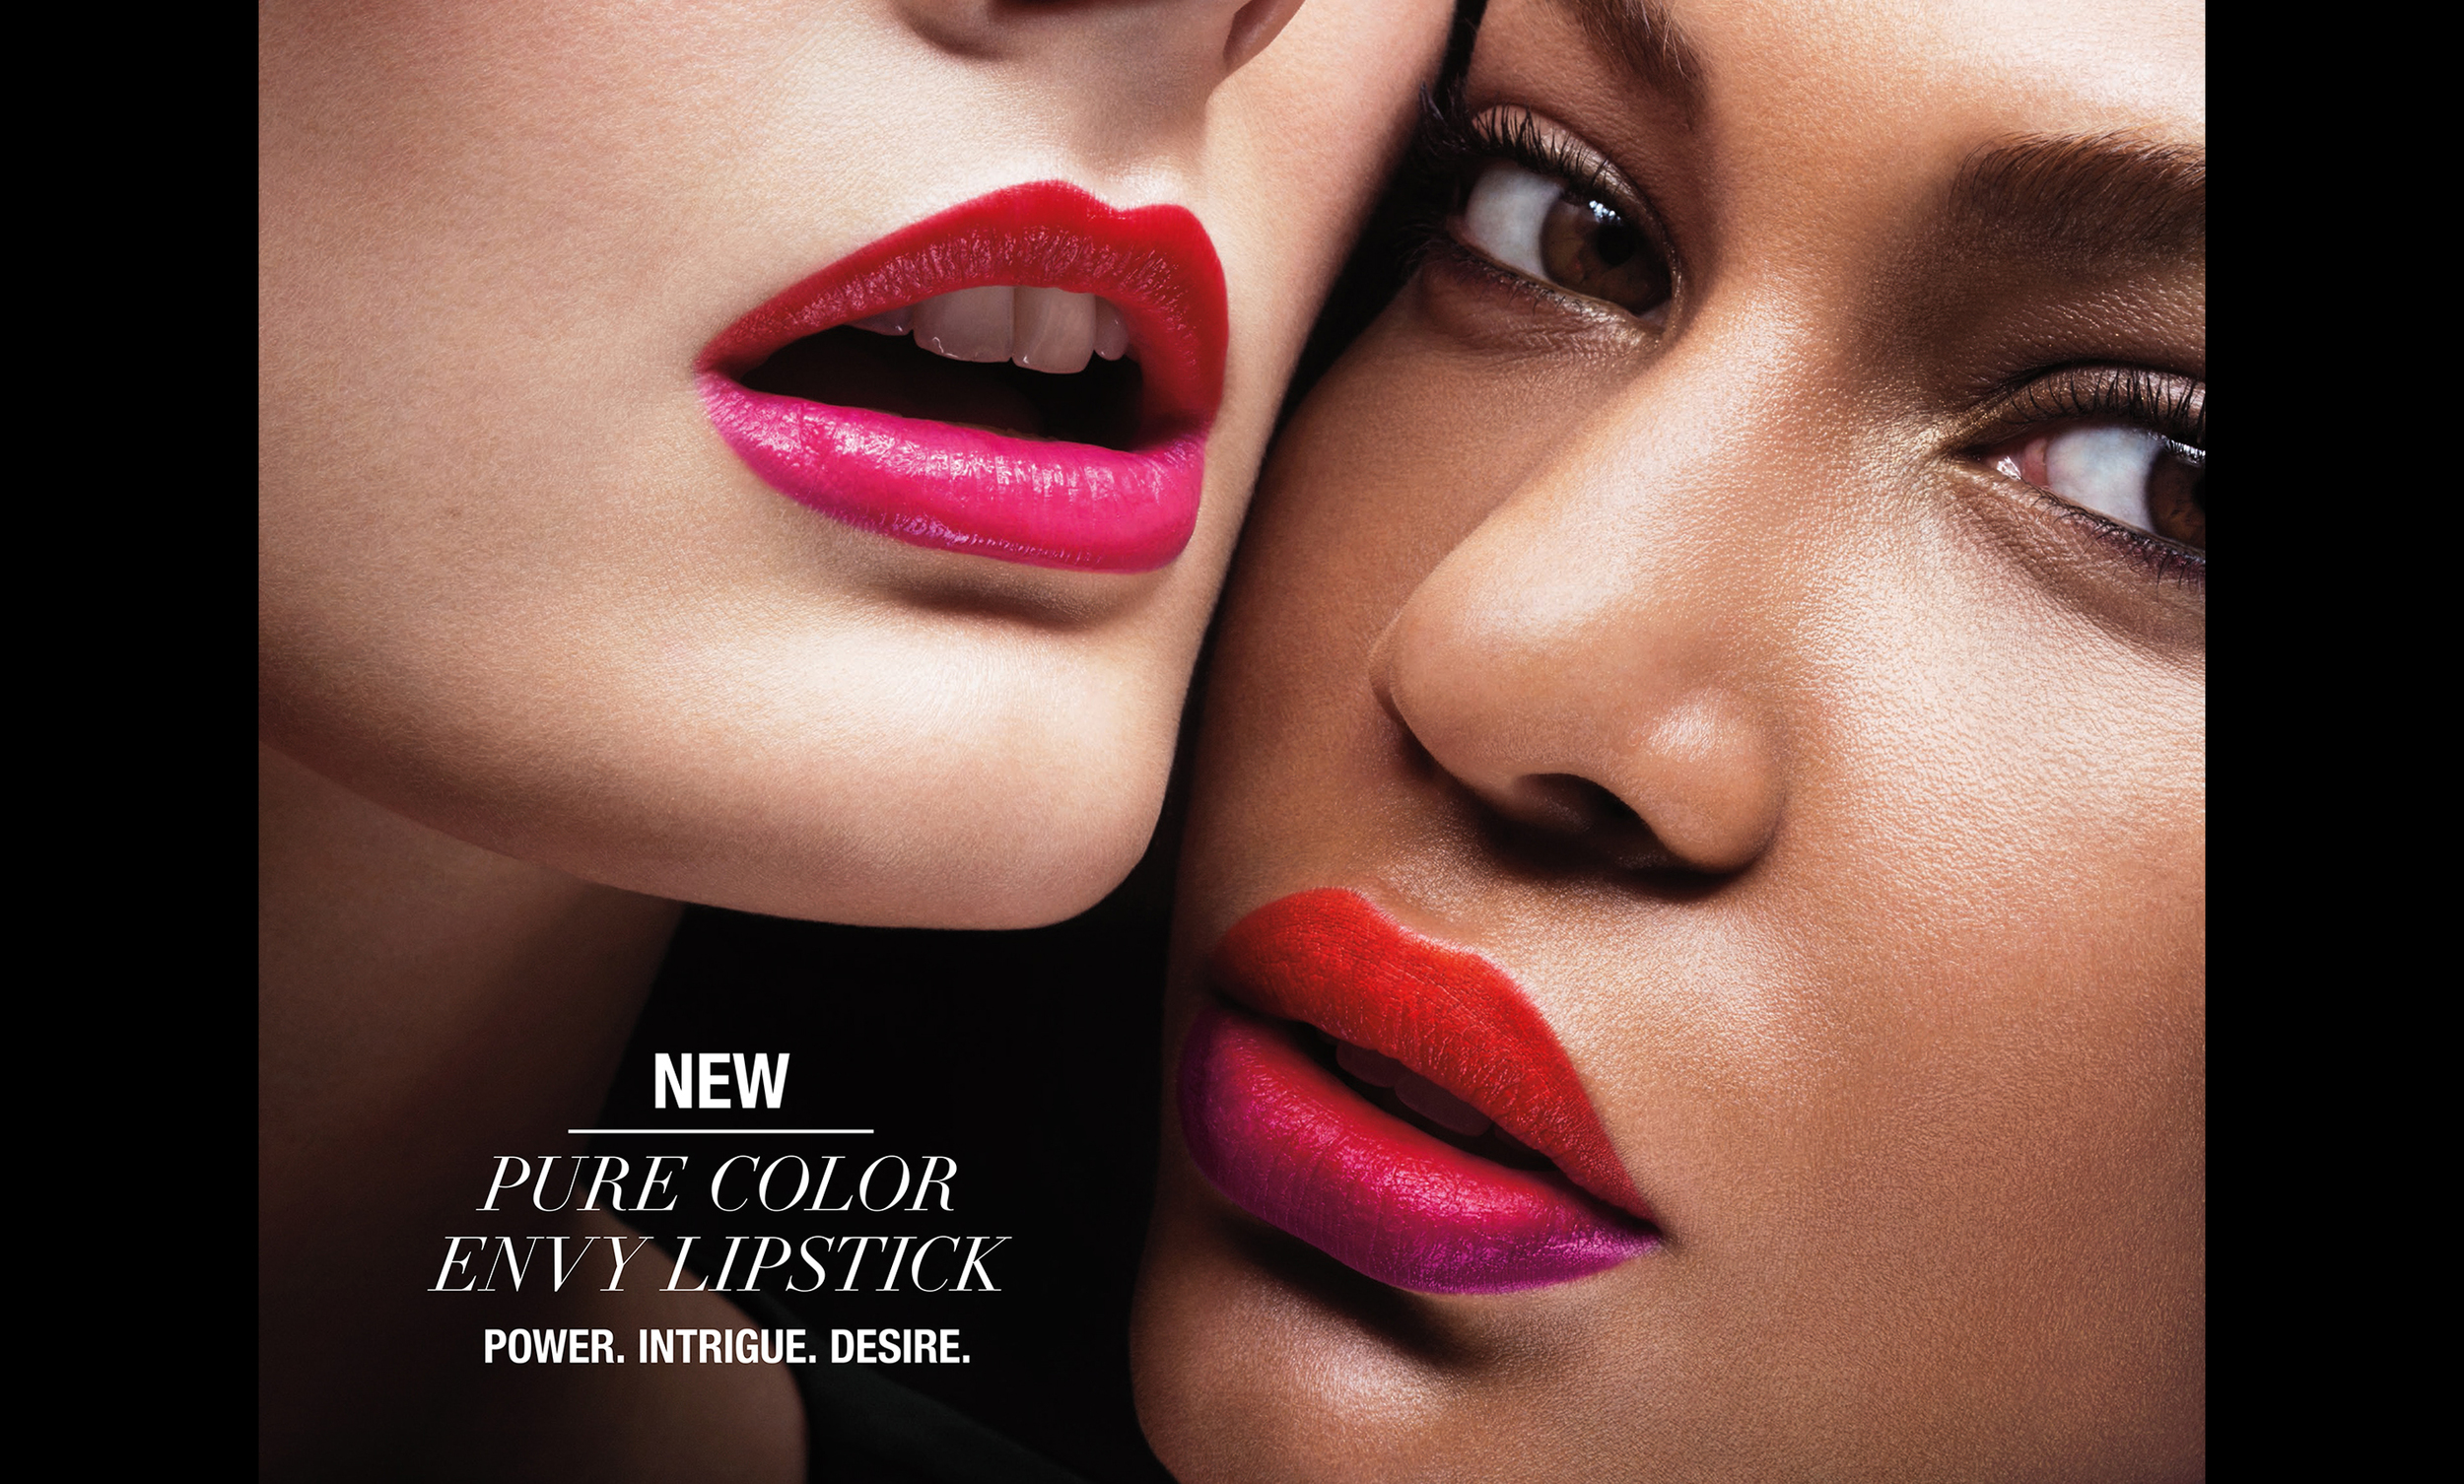 EL-pure-col-lipstick-bg.jpg